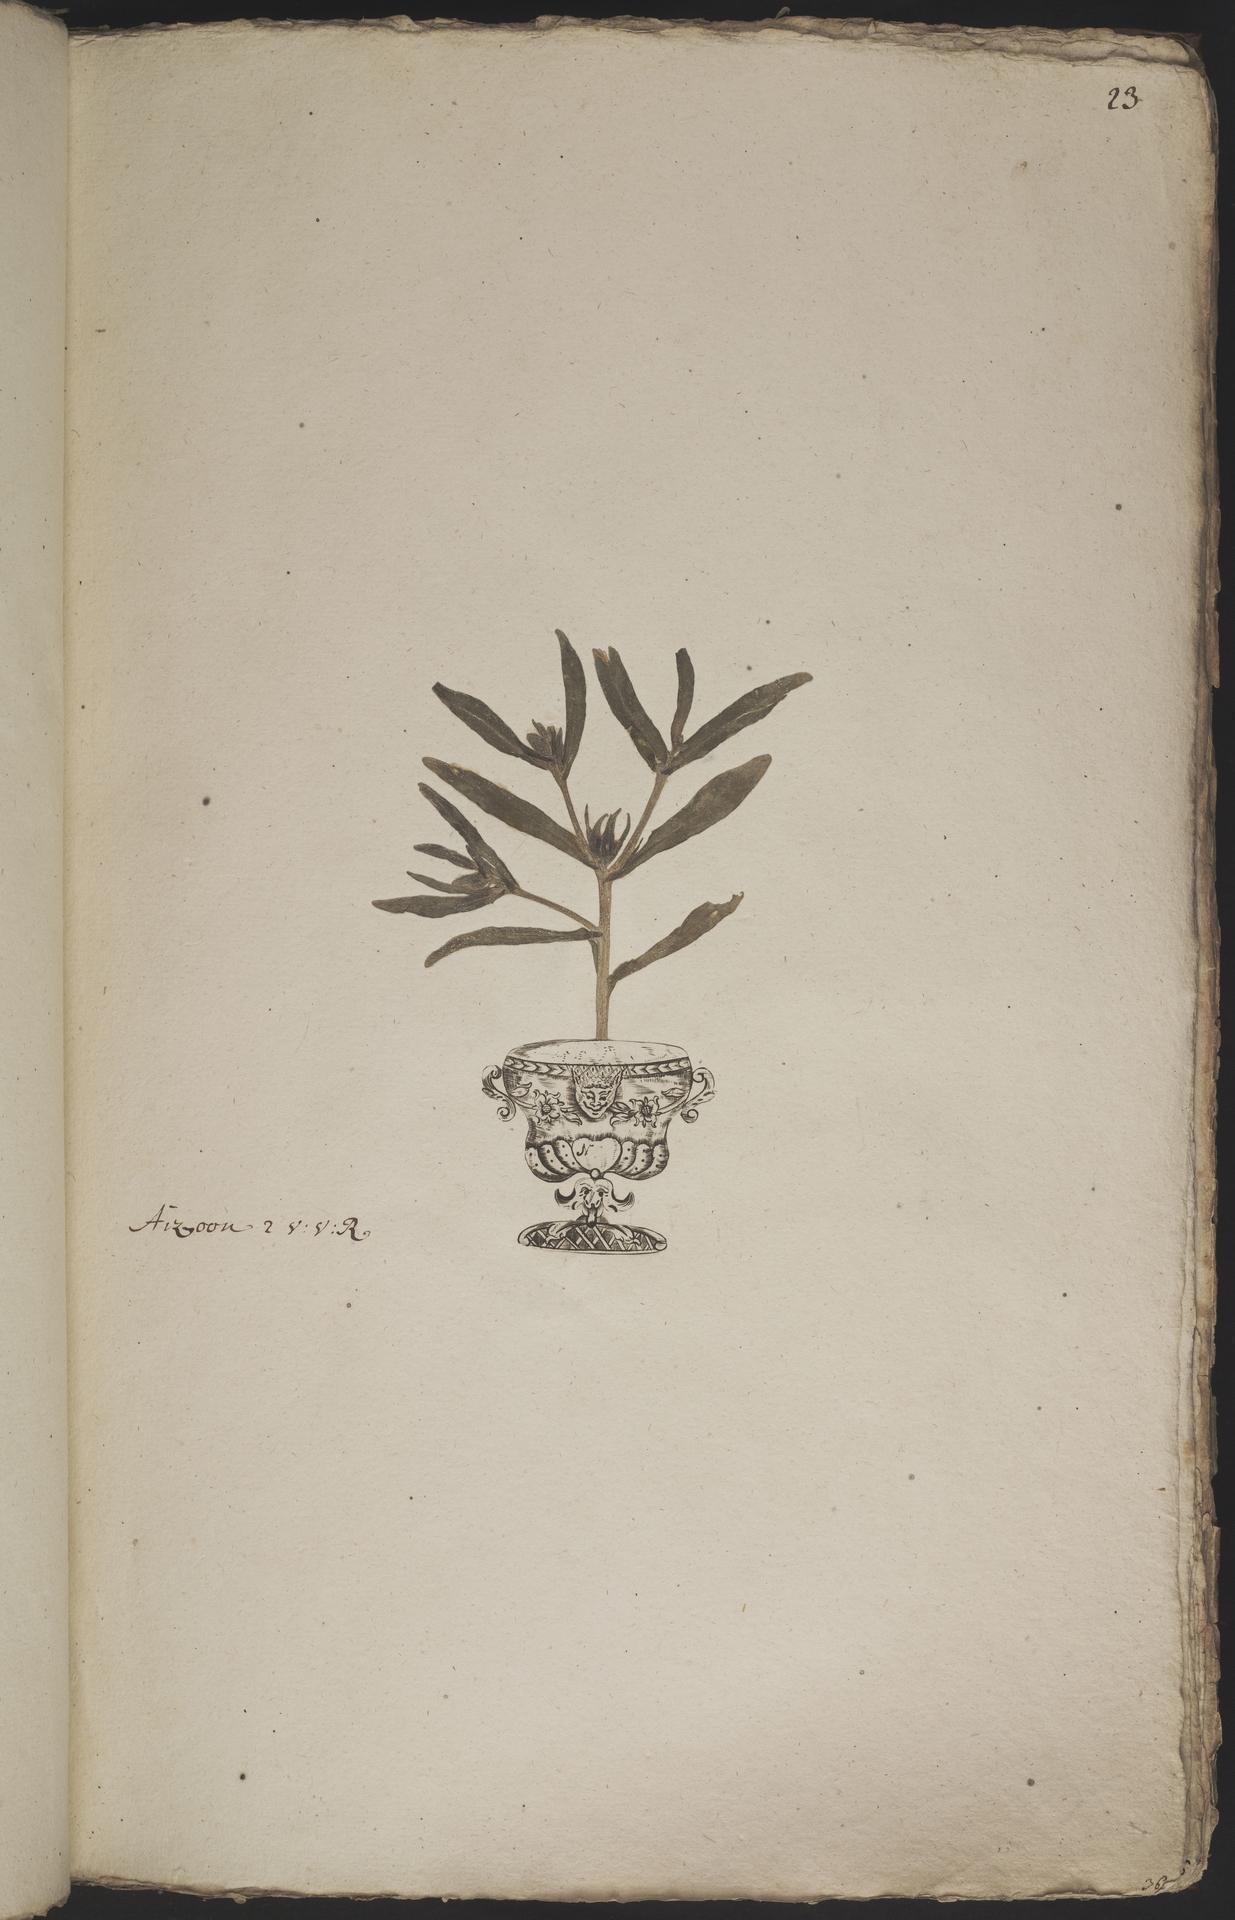 L.3960873   Aizoanthemum hispanicum (L.) H.E.K.Hartmann